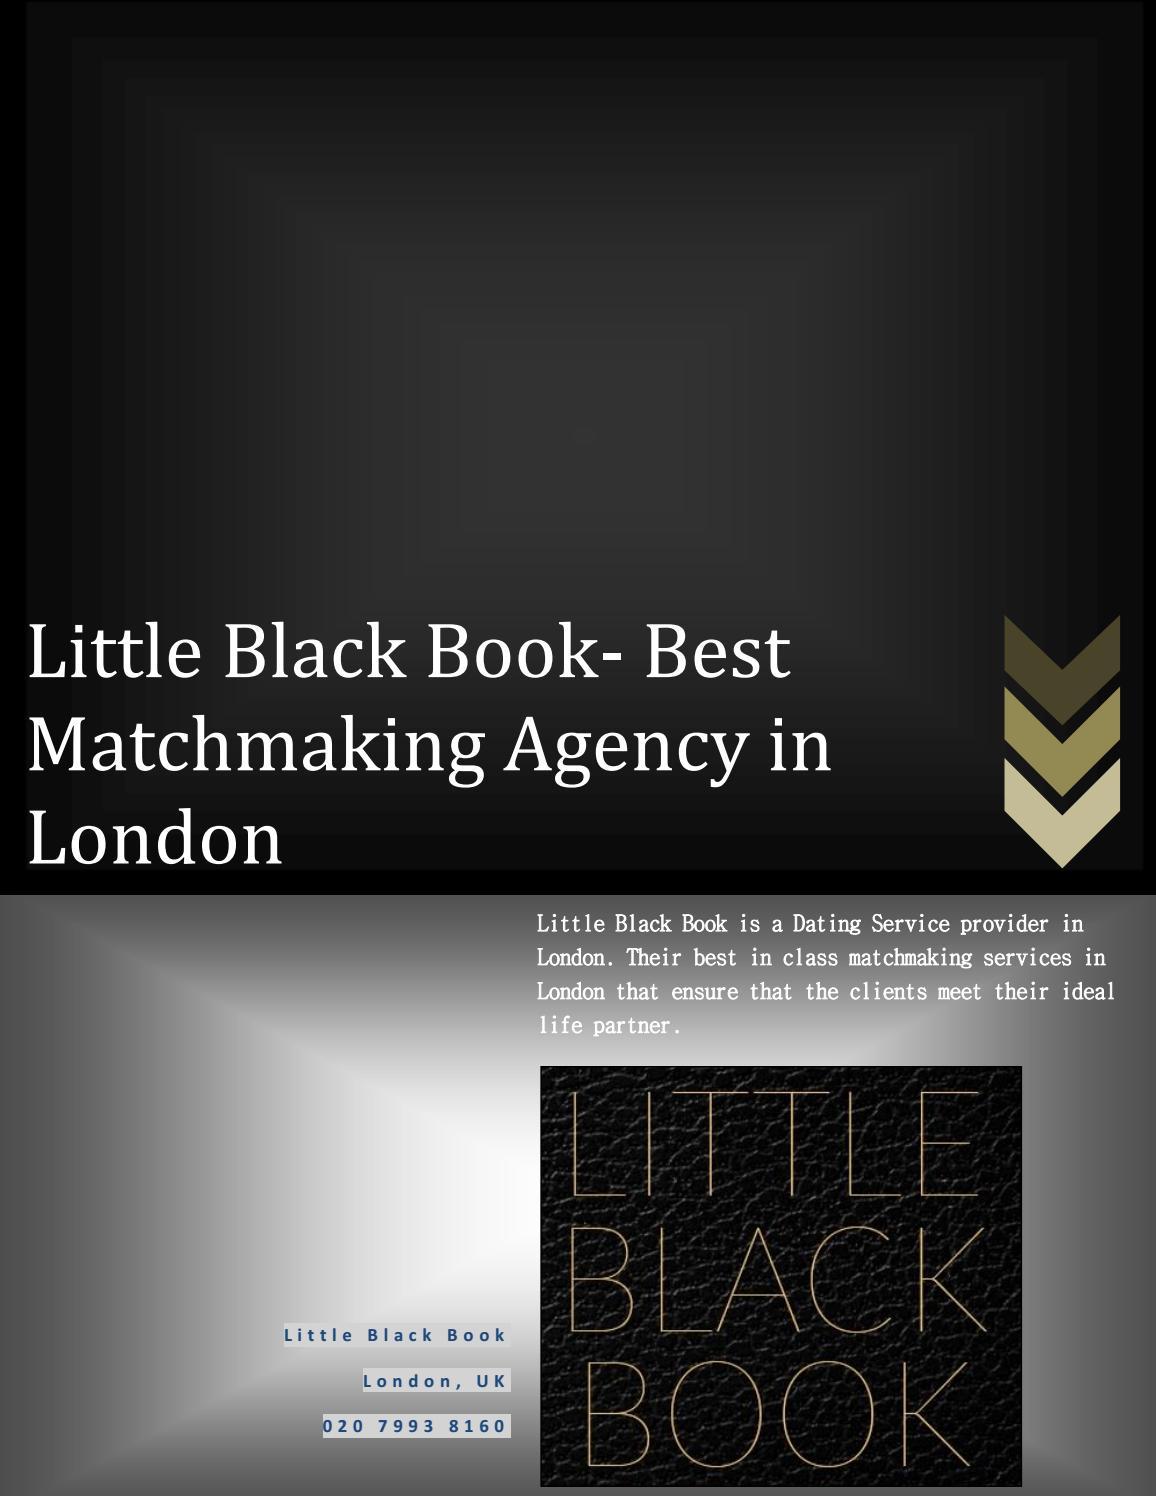 Blackbook dating service arab dating apps